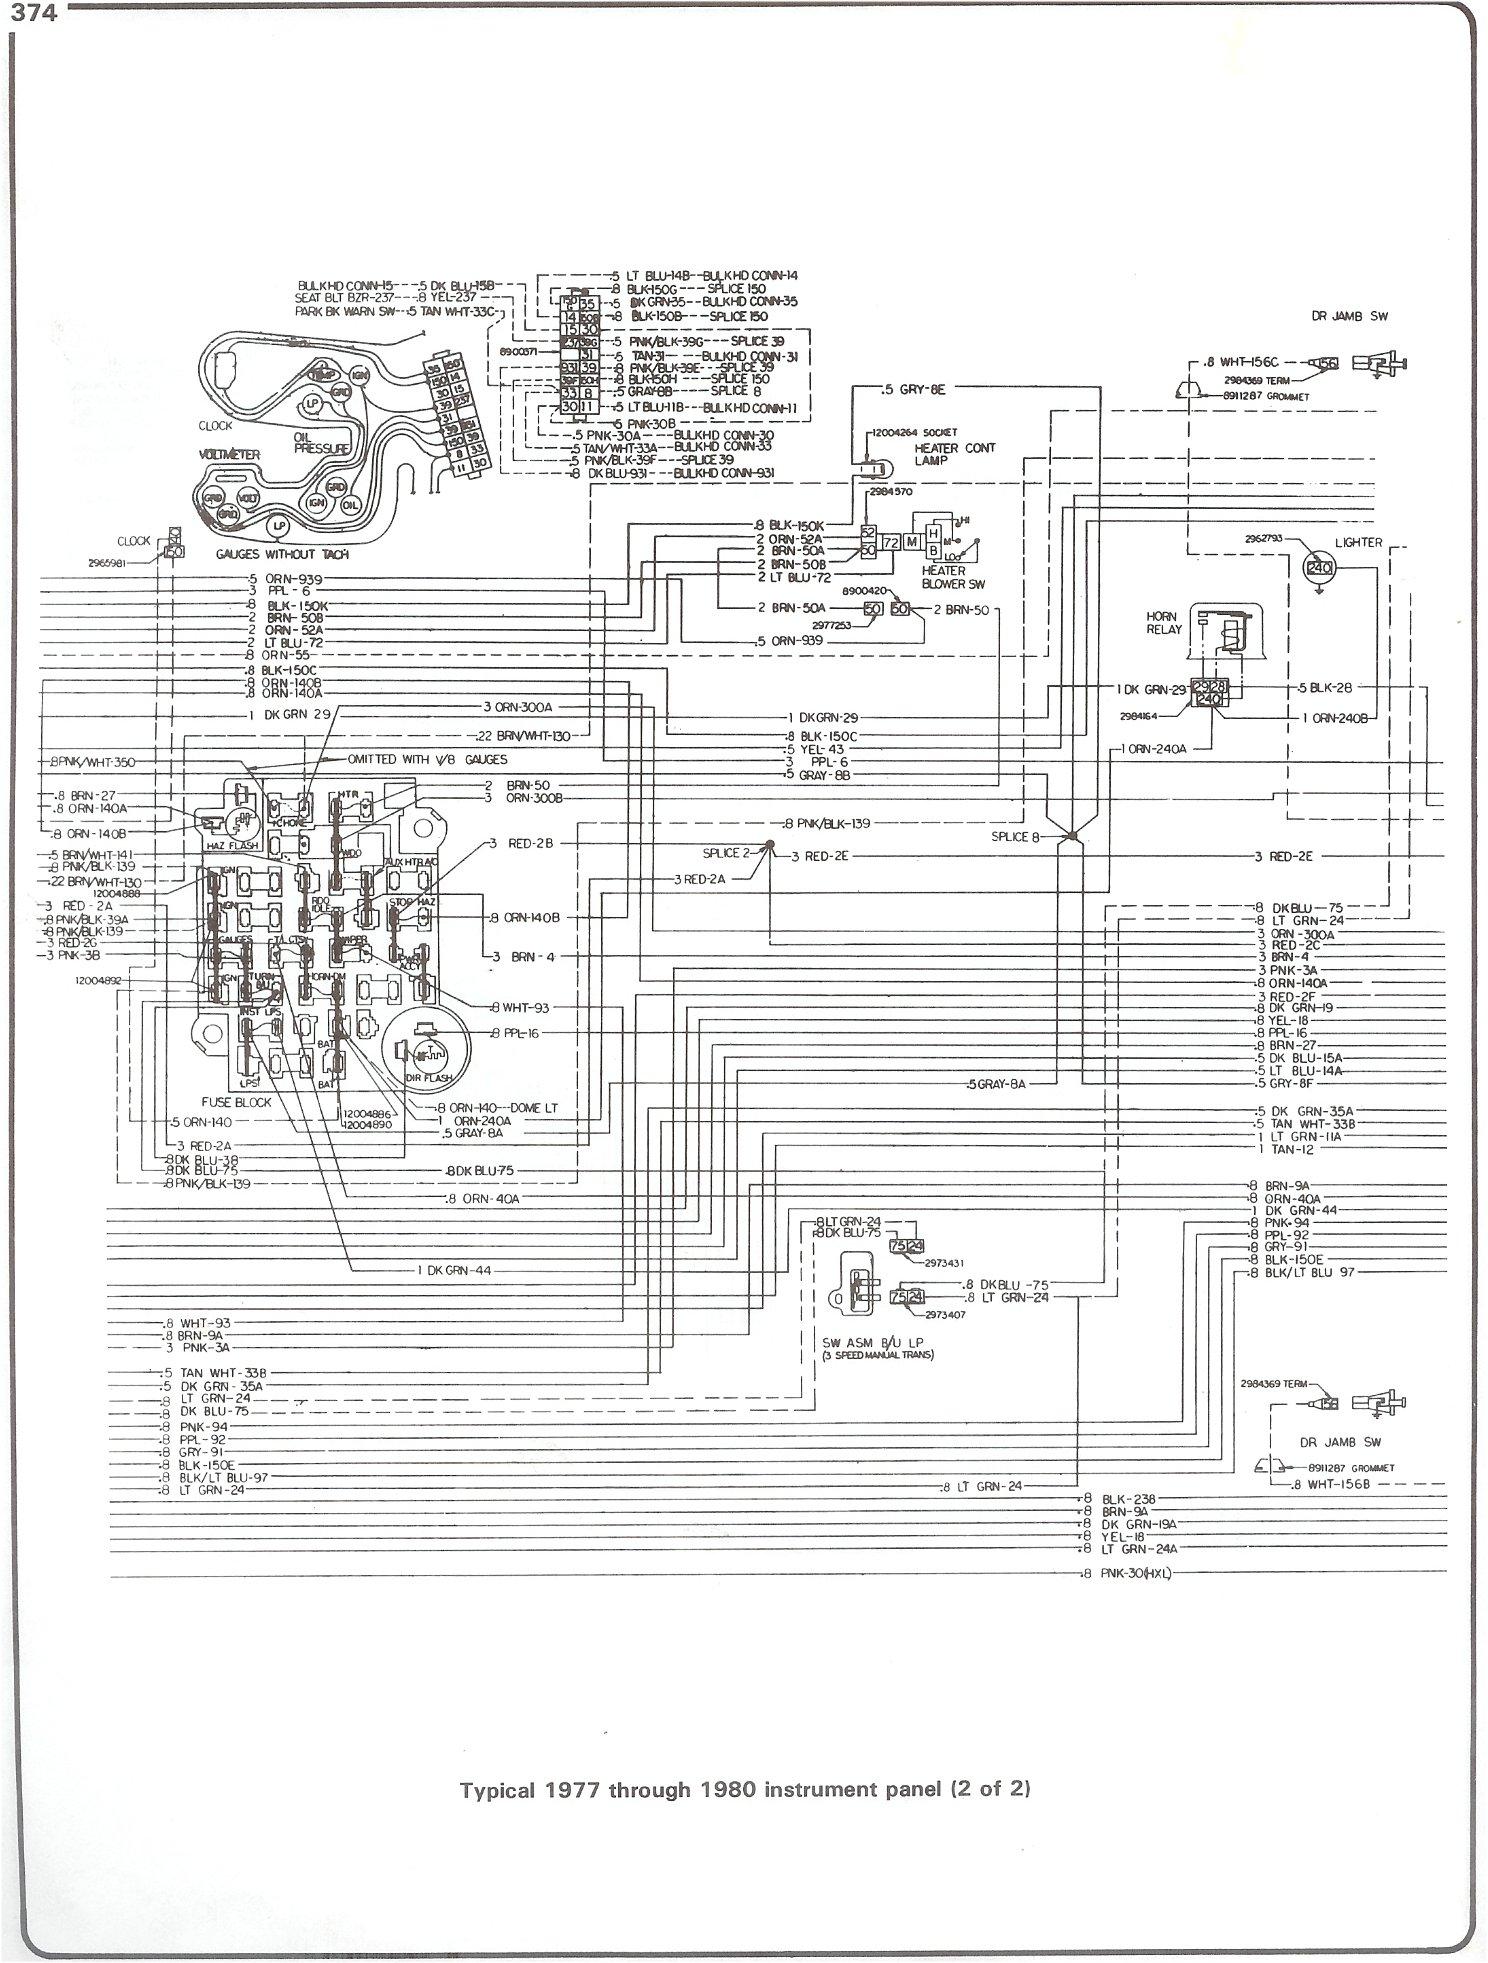 1982 C10 Chevy Truck Wiring Diagram | wiring diagram source closing | Chevrolet Truck Wiring Diagrams For 1982 |  | fercolorferramenta.it